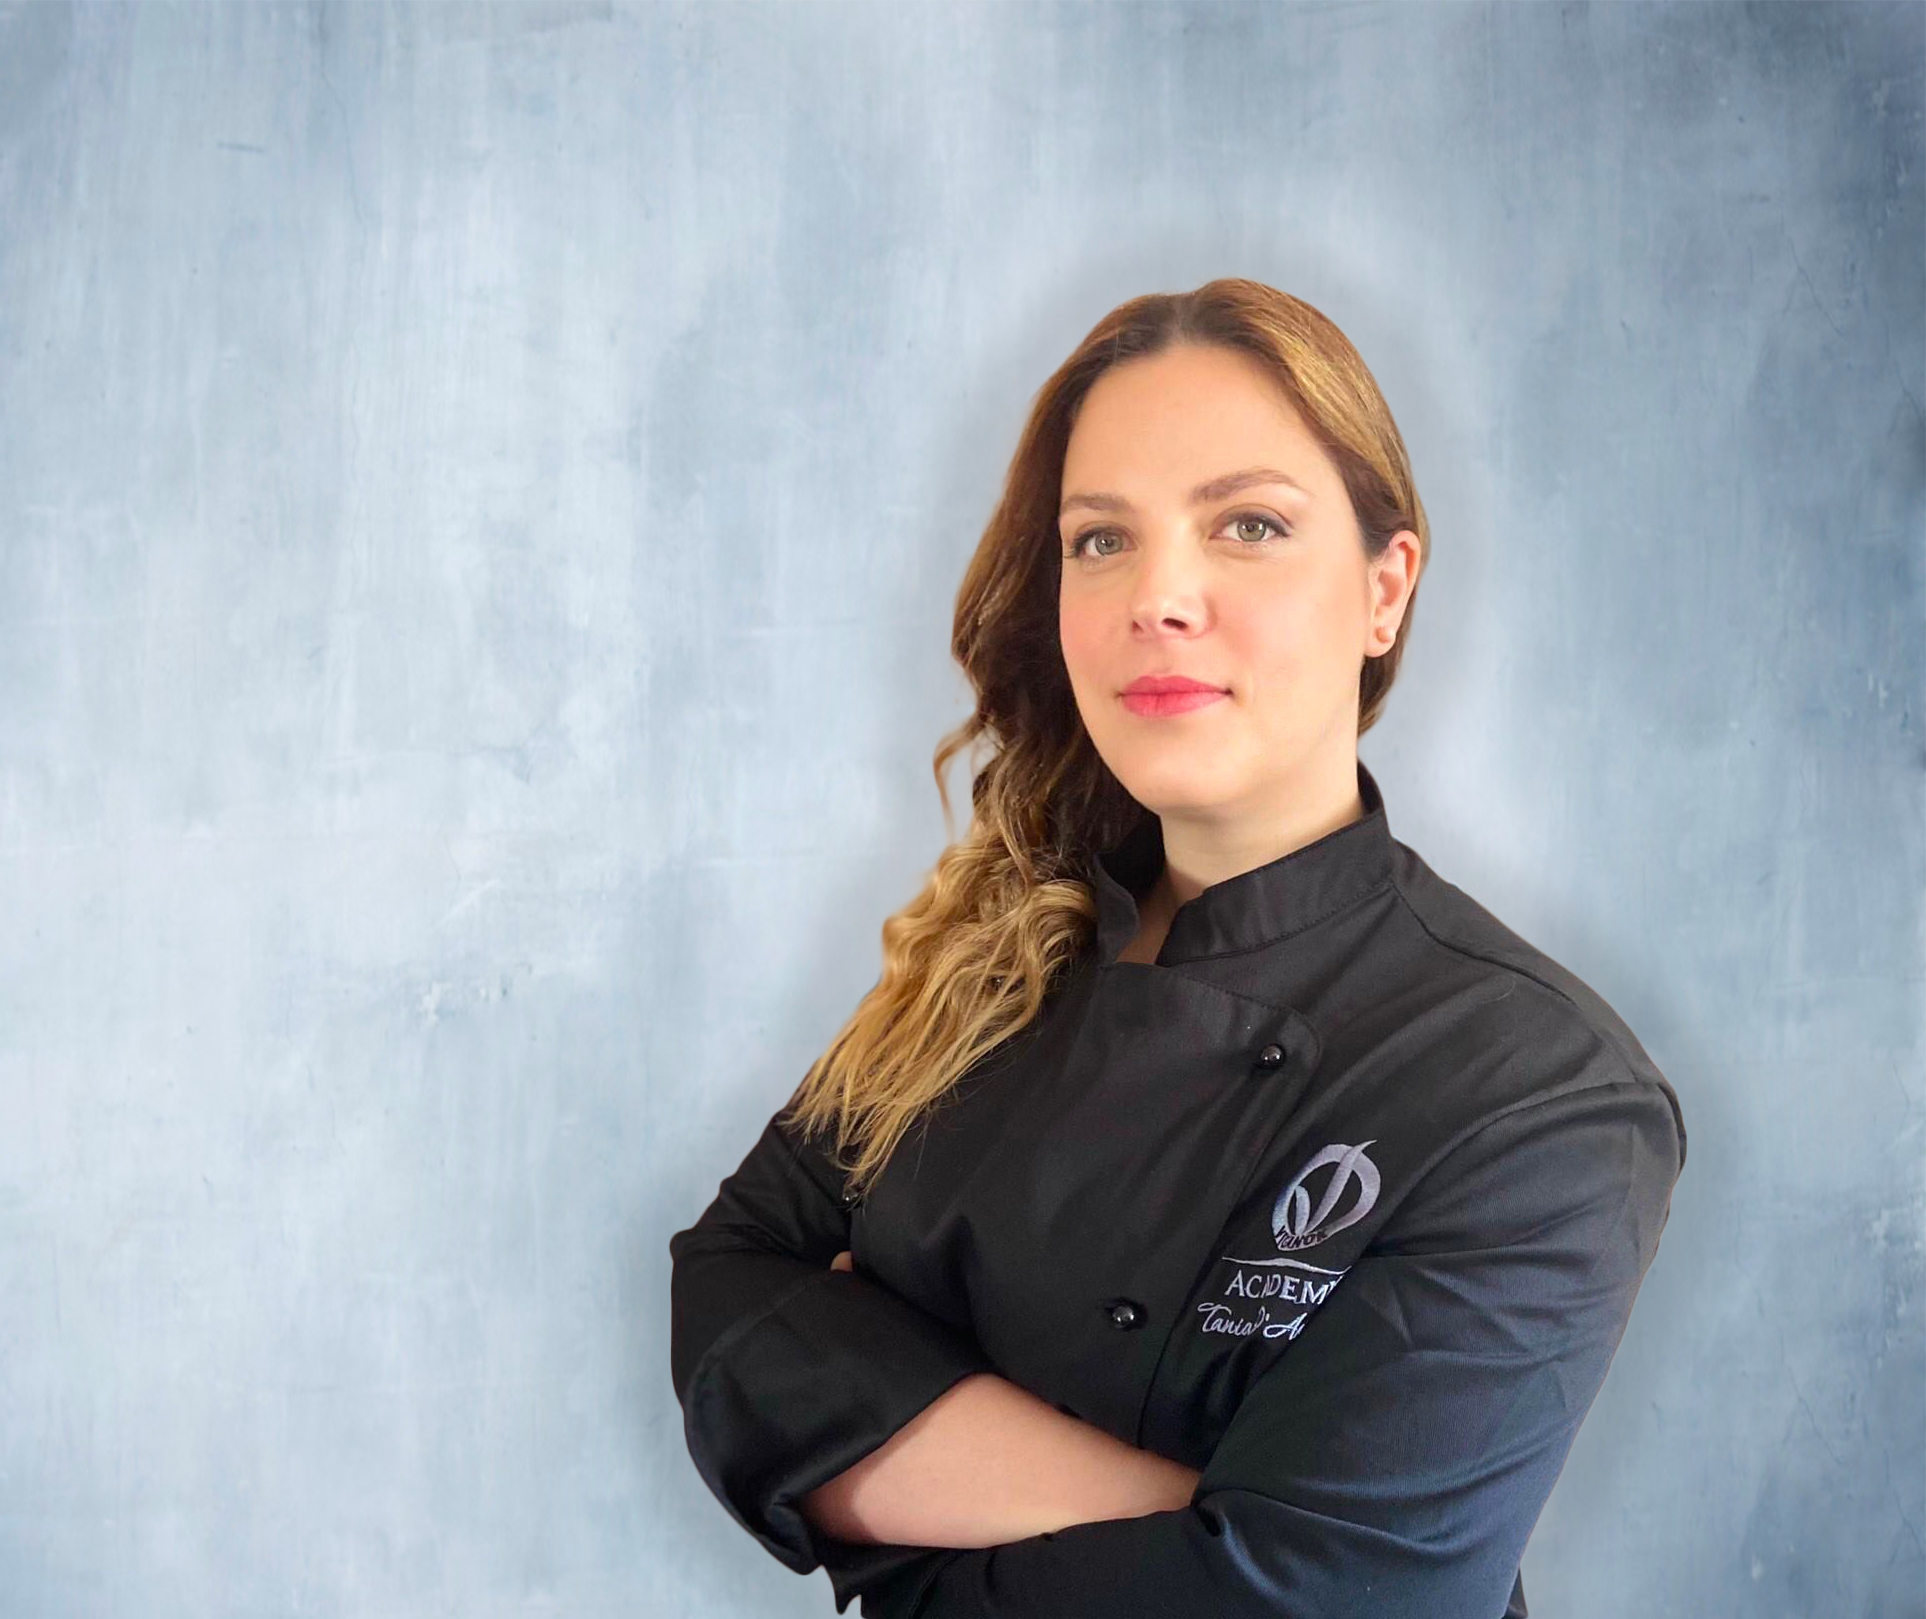 Tania D'Aniello